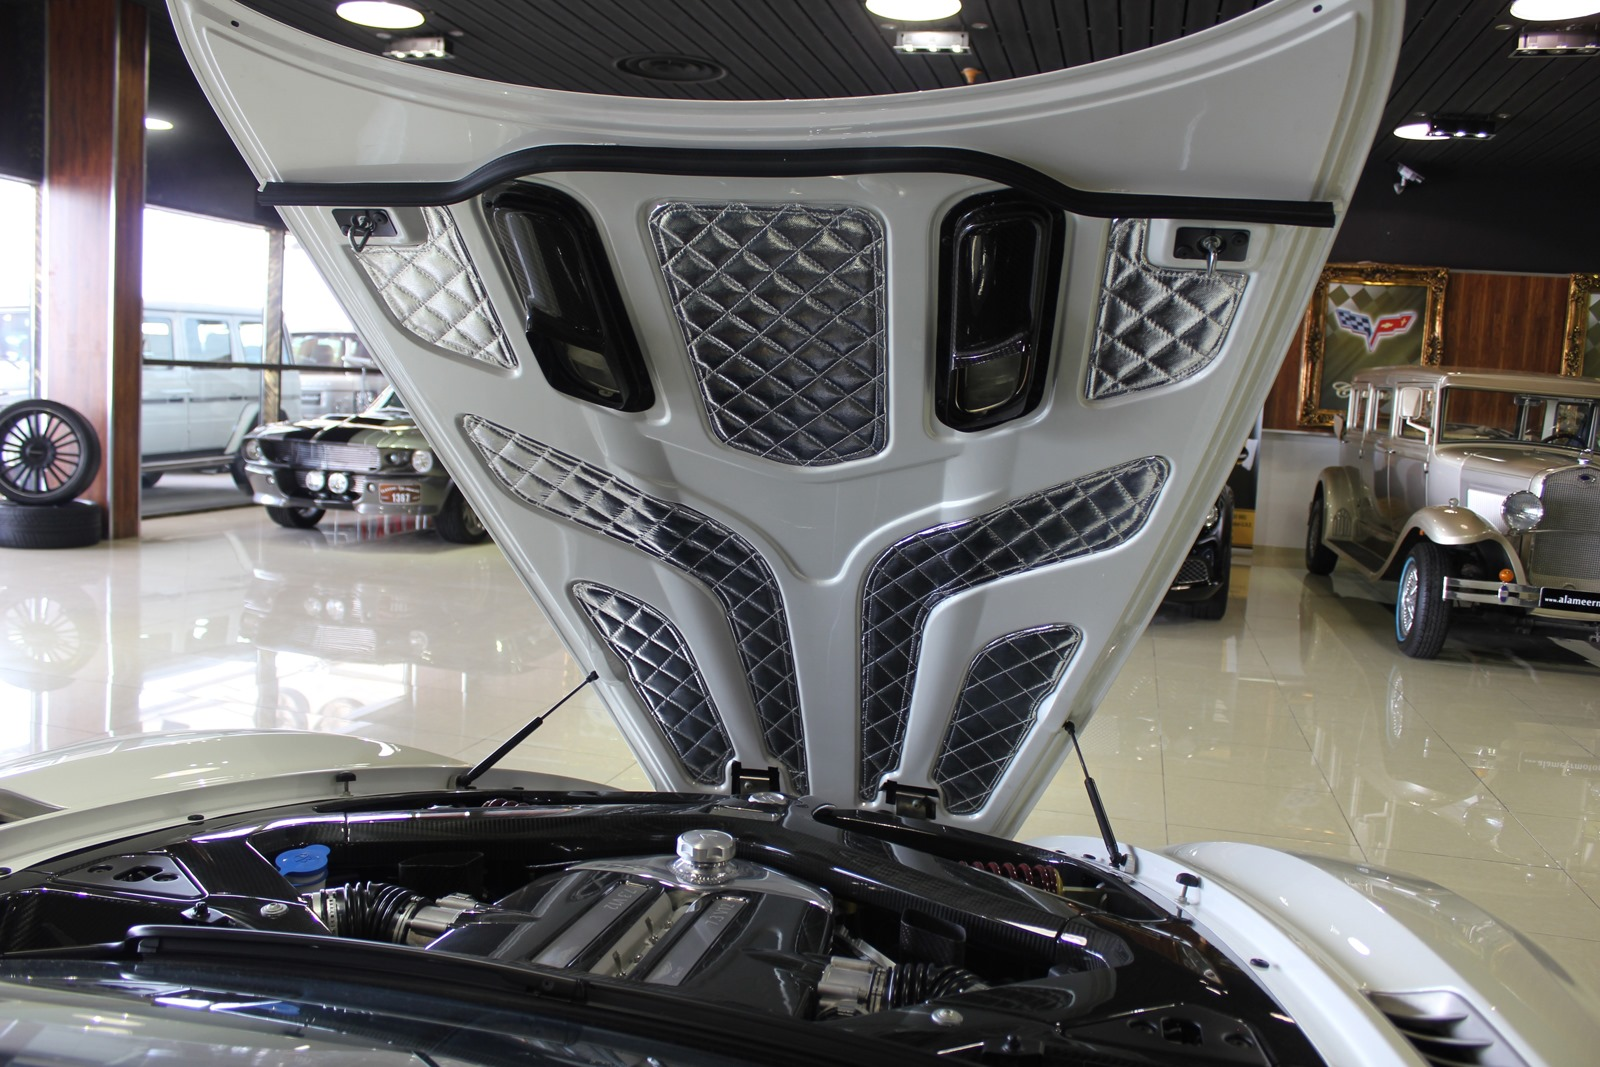 Aston-Martin-One-77-12%25255B3%25255D.jpg